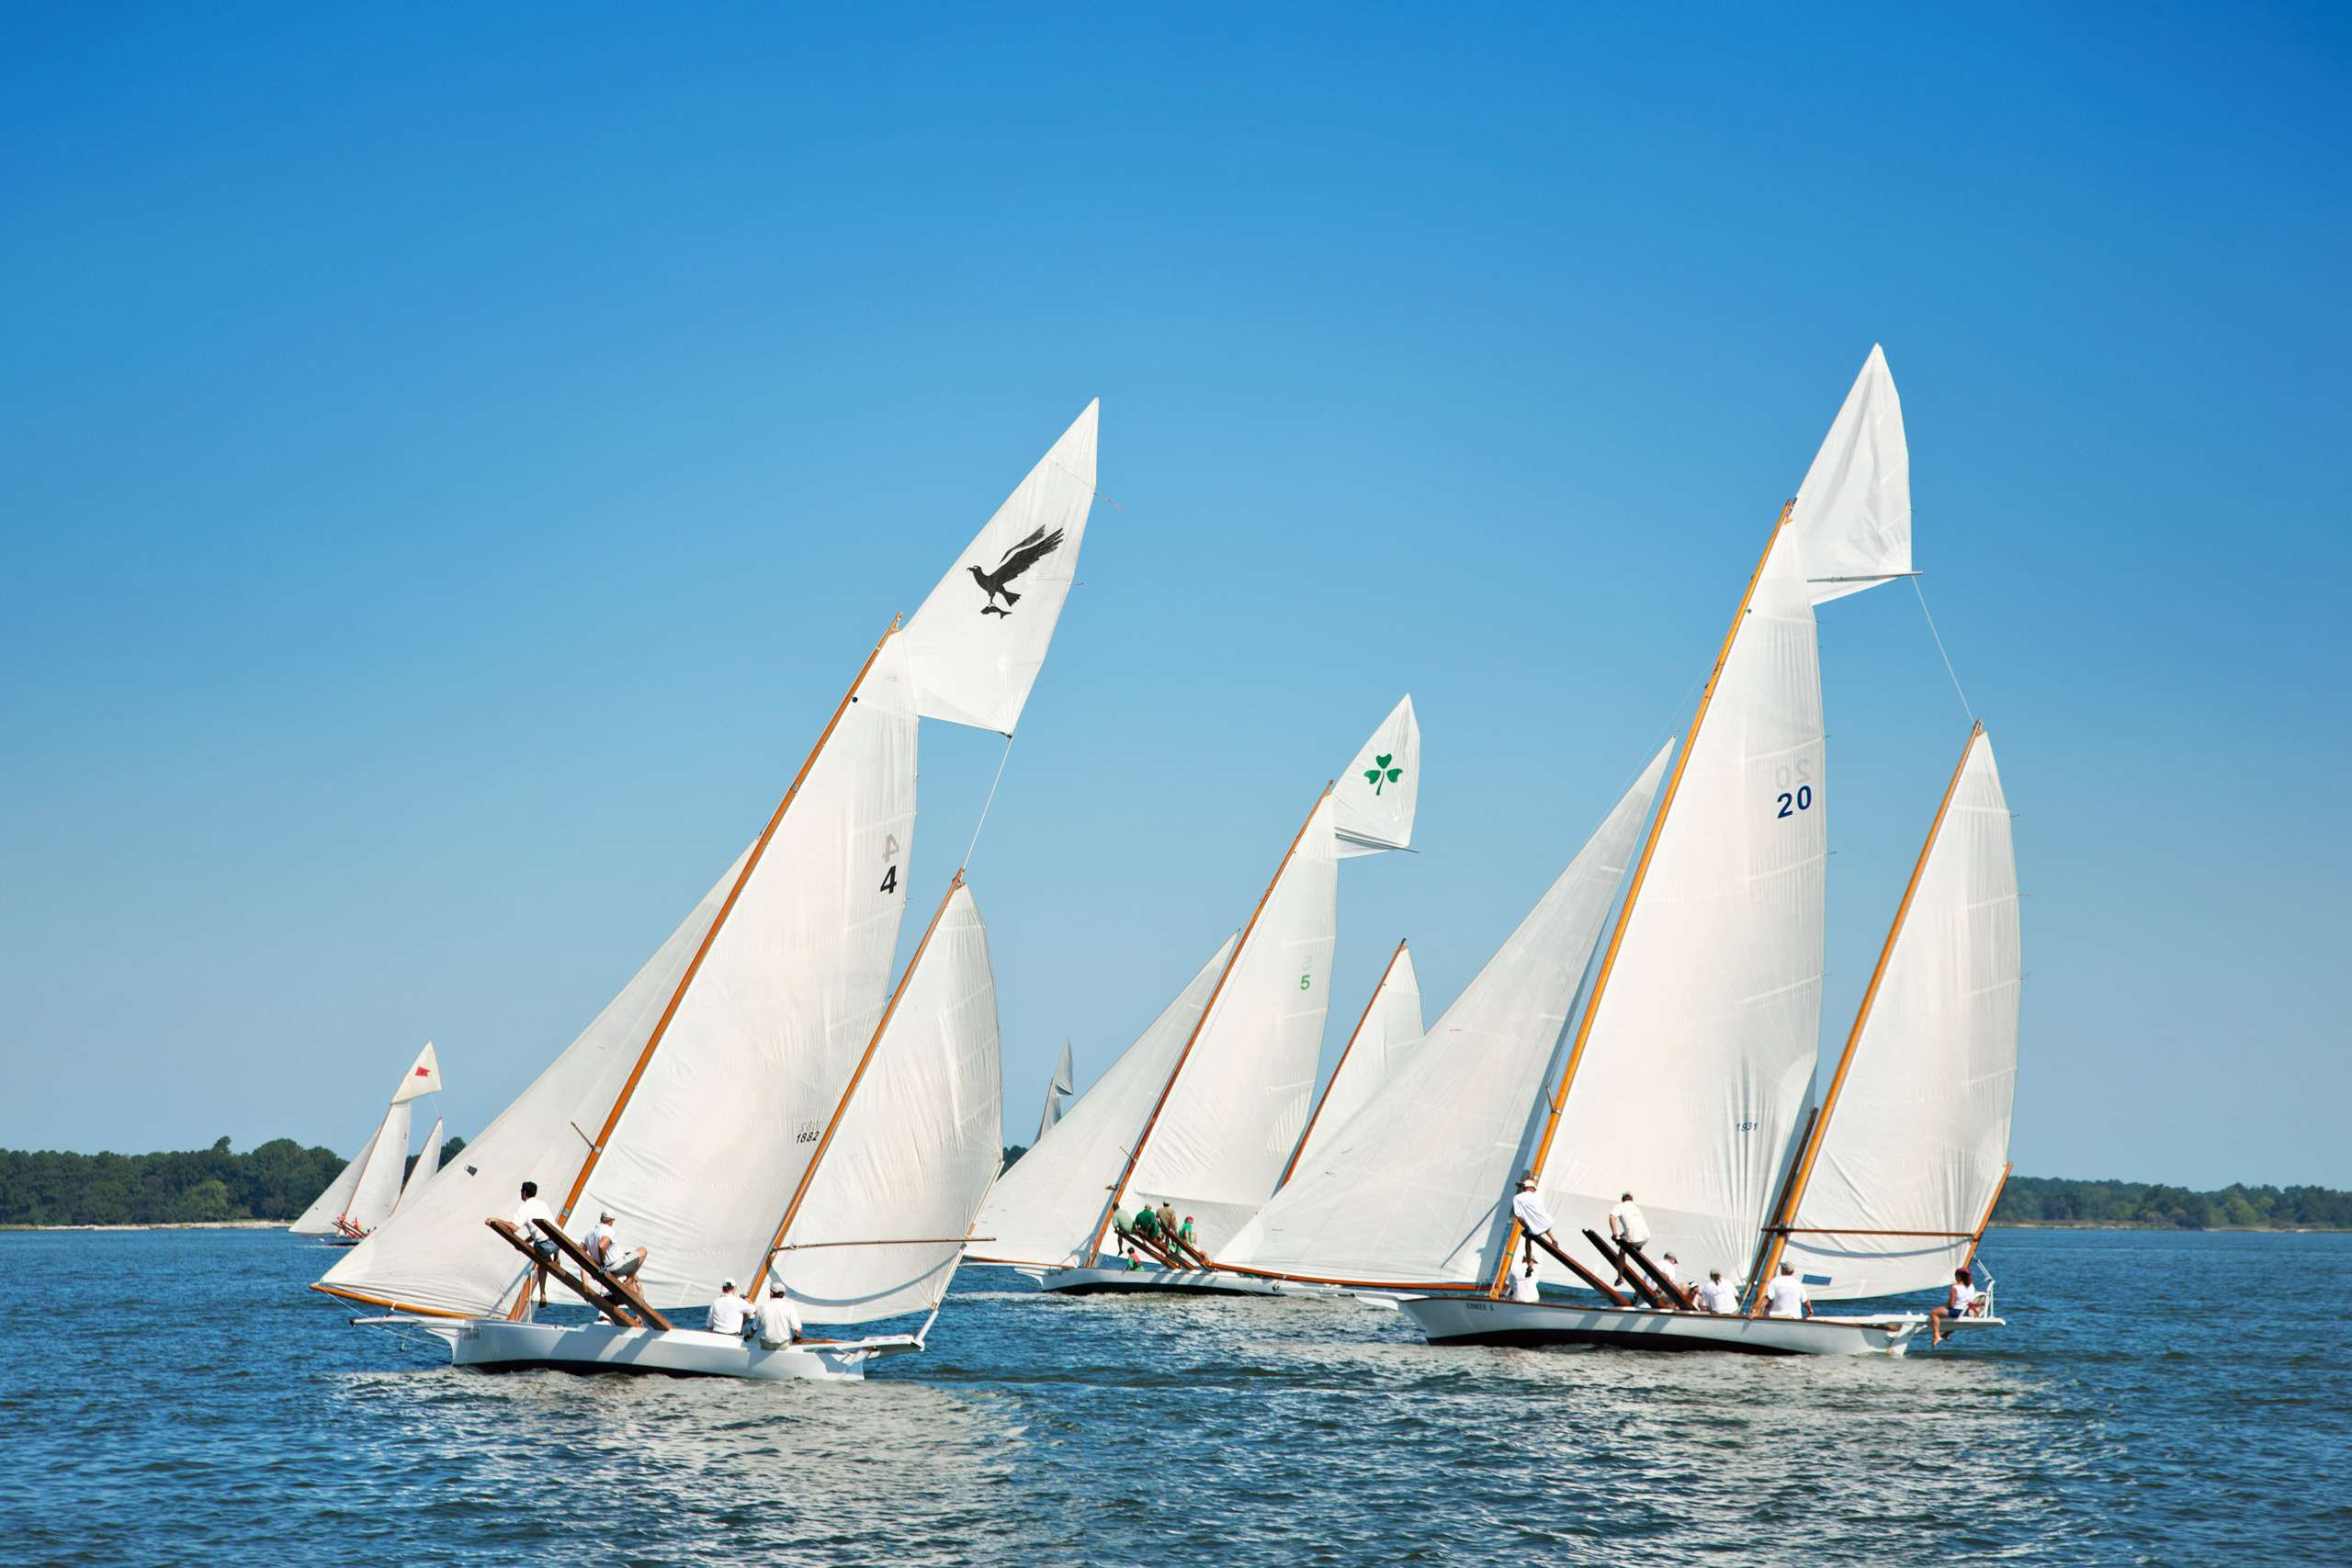 PORTFOLIO - Sailing - Log Canoes #25   PCG577